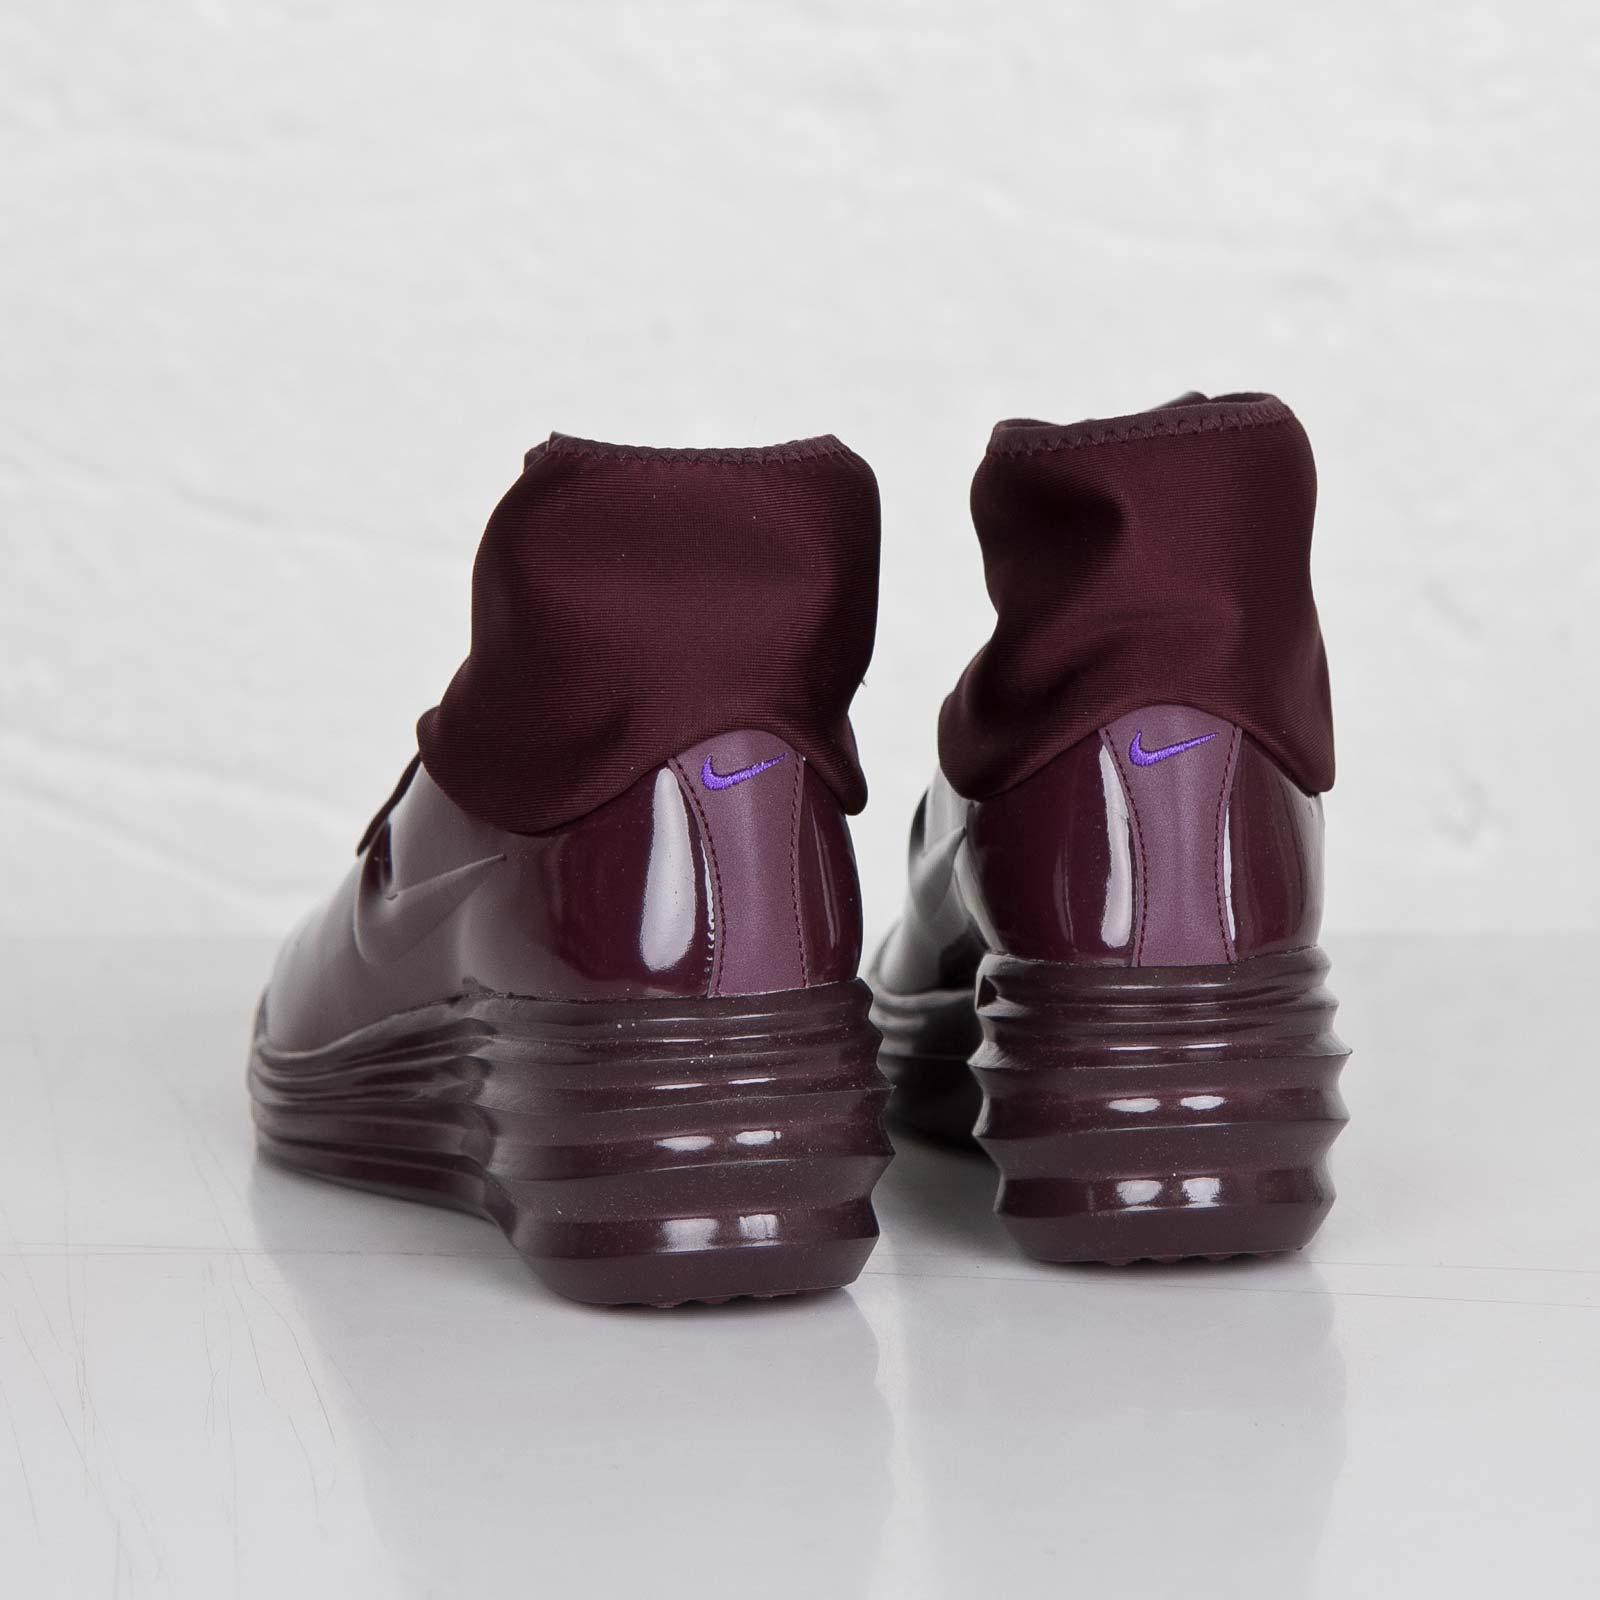 huge selection of 55e84 7eca2 where can i buy nike wmns lunarelite sky hi sneakerboot 03cf6 300bc